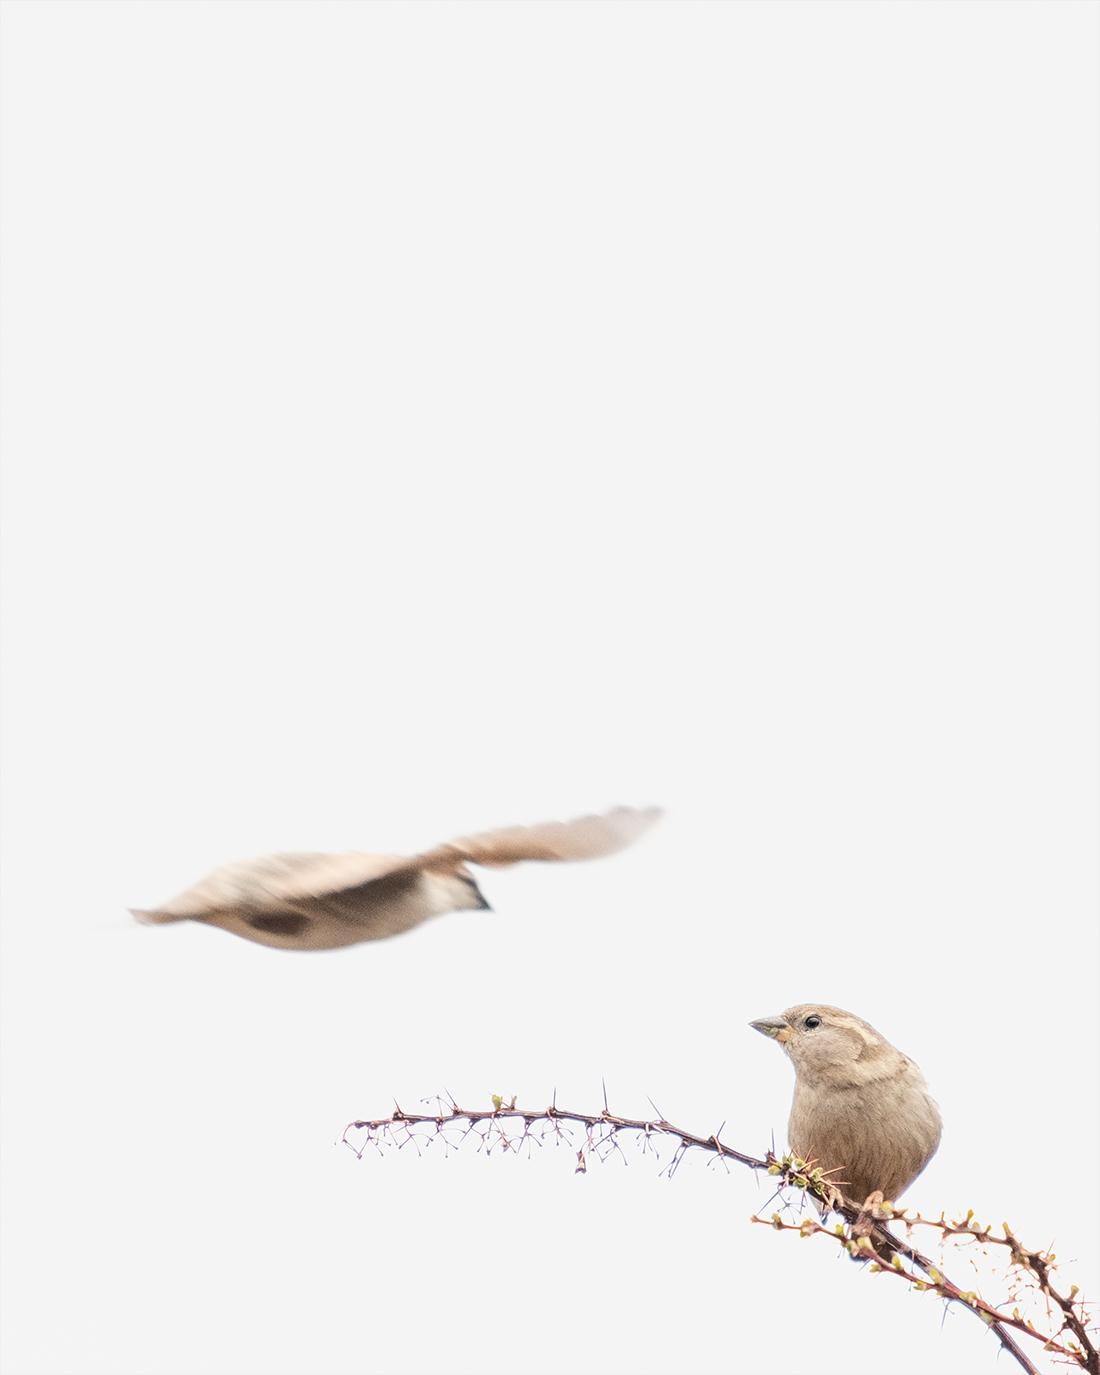 DSCF3131-2-WEB-fuglefoto-gråspurv-kunstfoto-cecilie-jystad